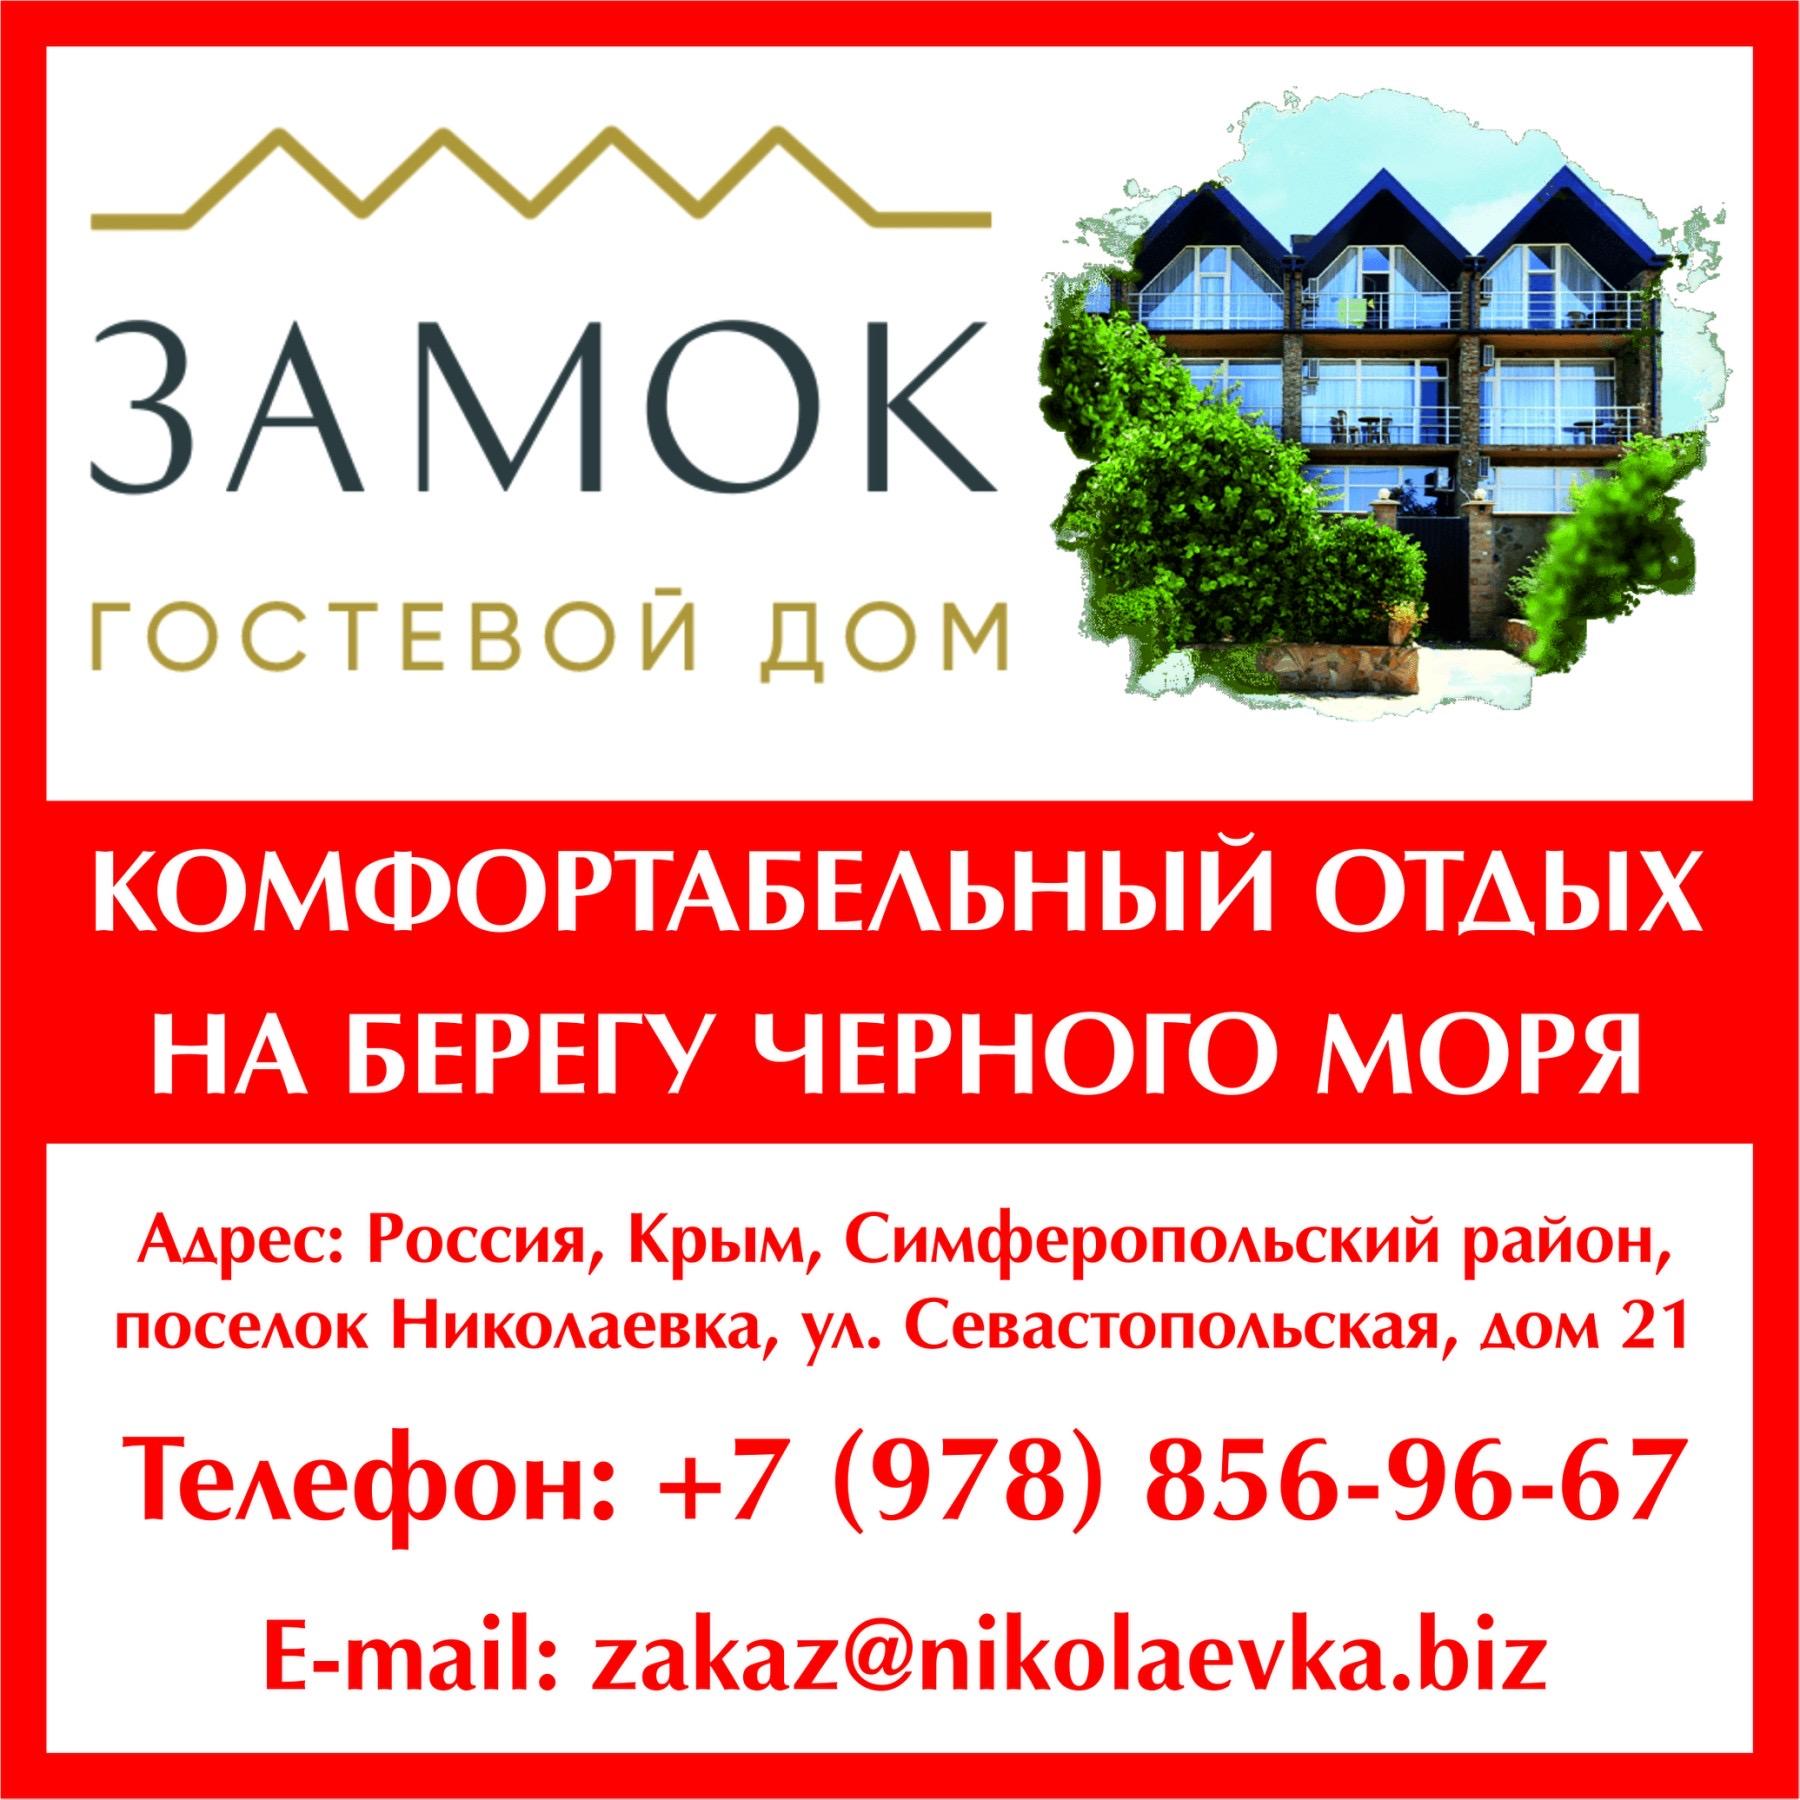 ZamokГостДомНиколаевка